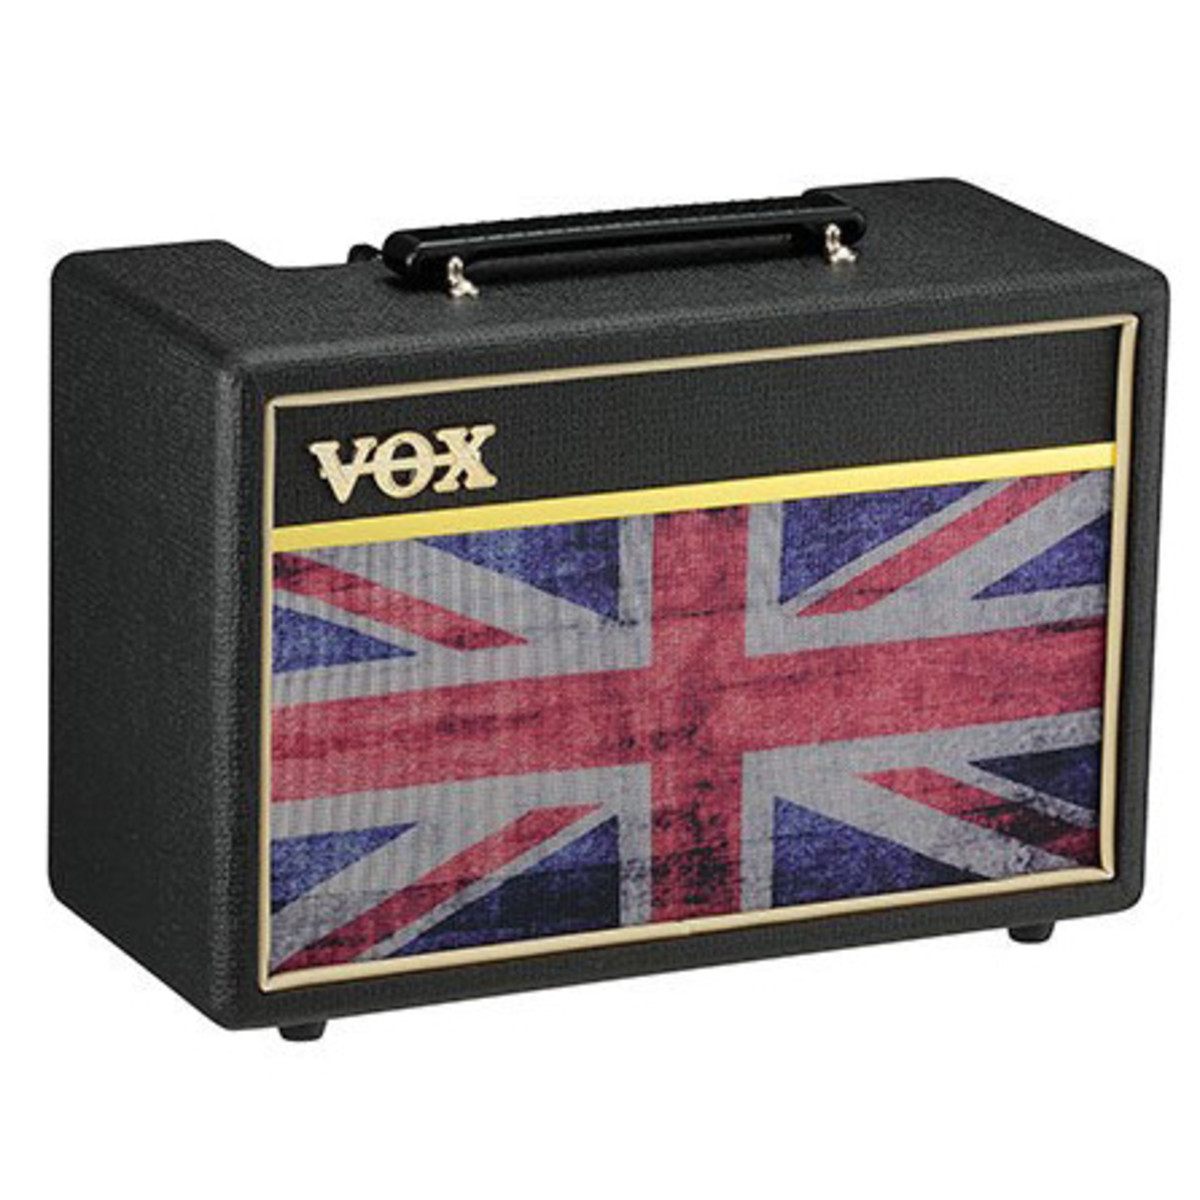 Vox Pathfinder 10 Union Jack A